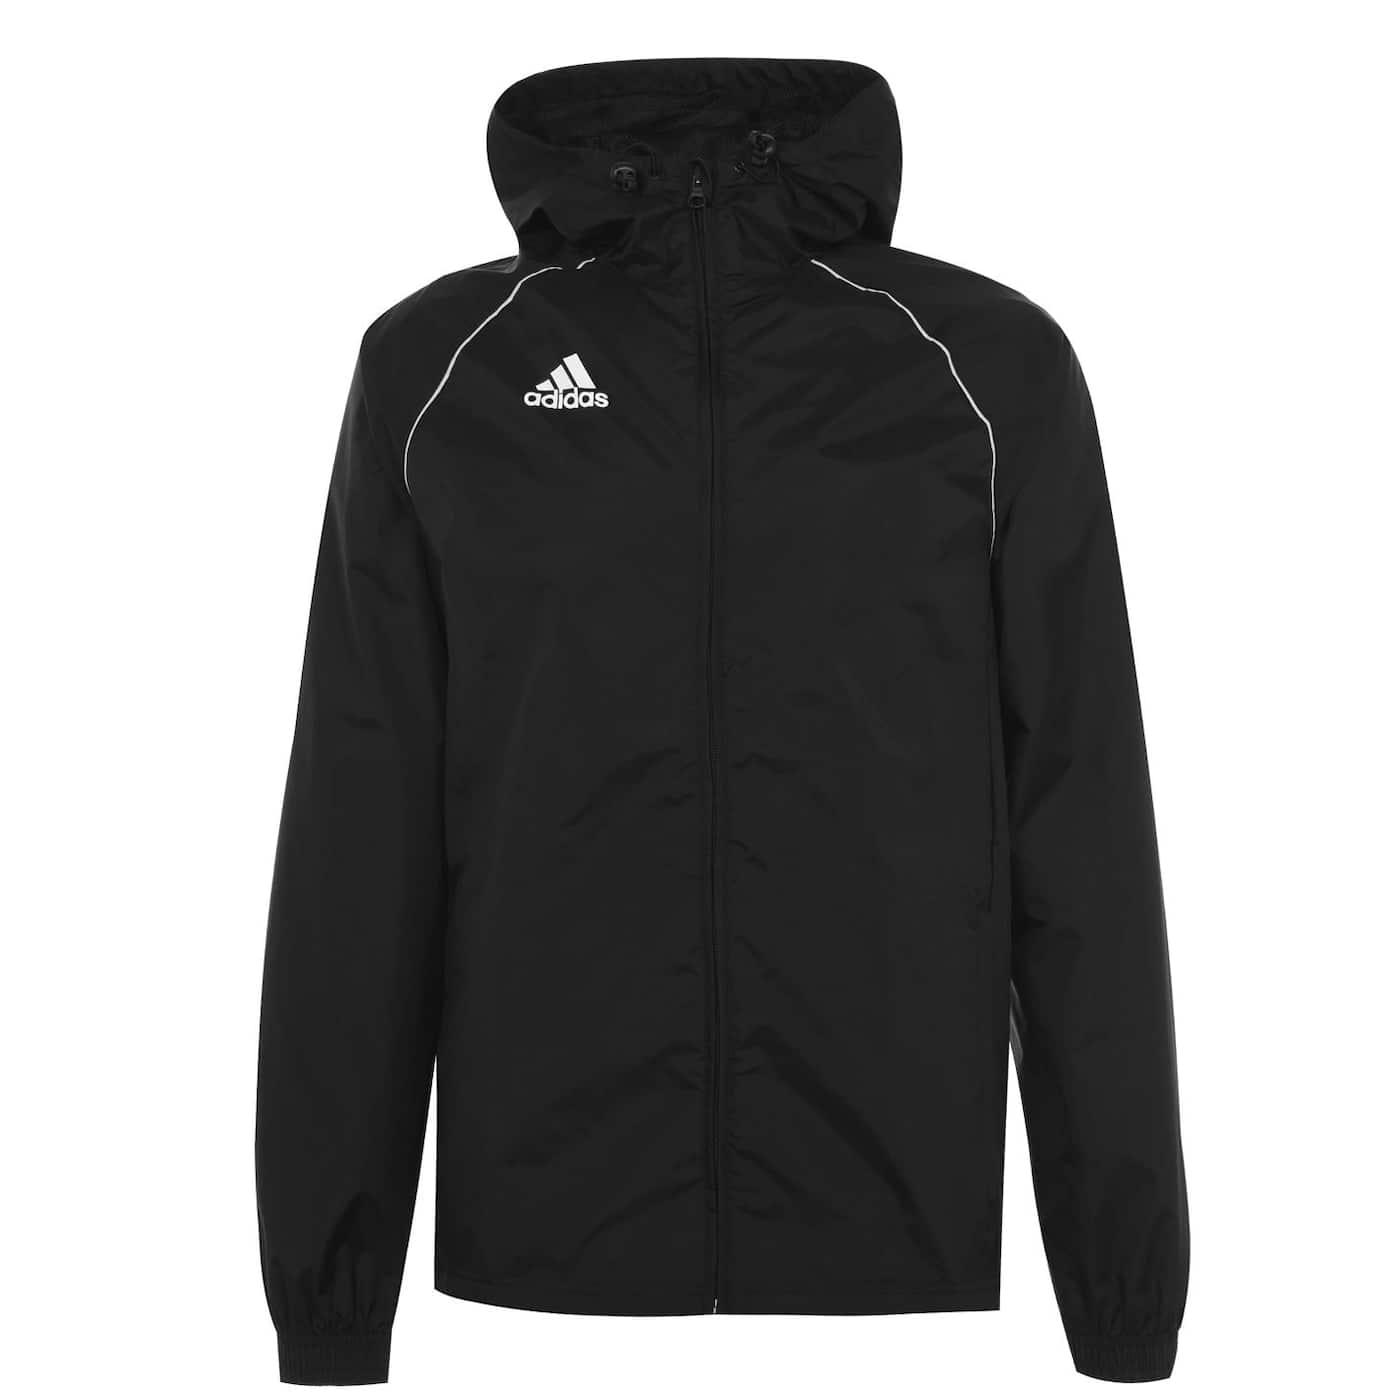 Adidas Rain Jacket Mens